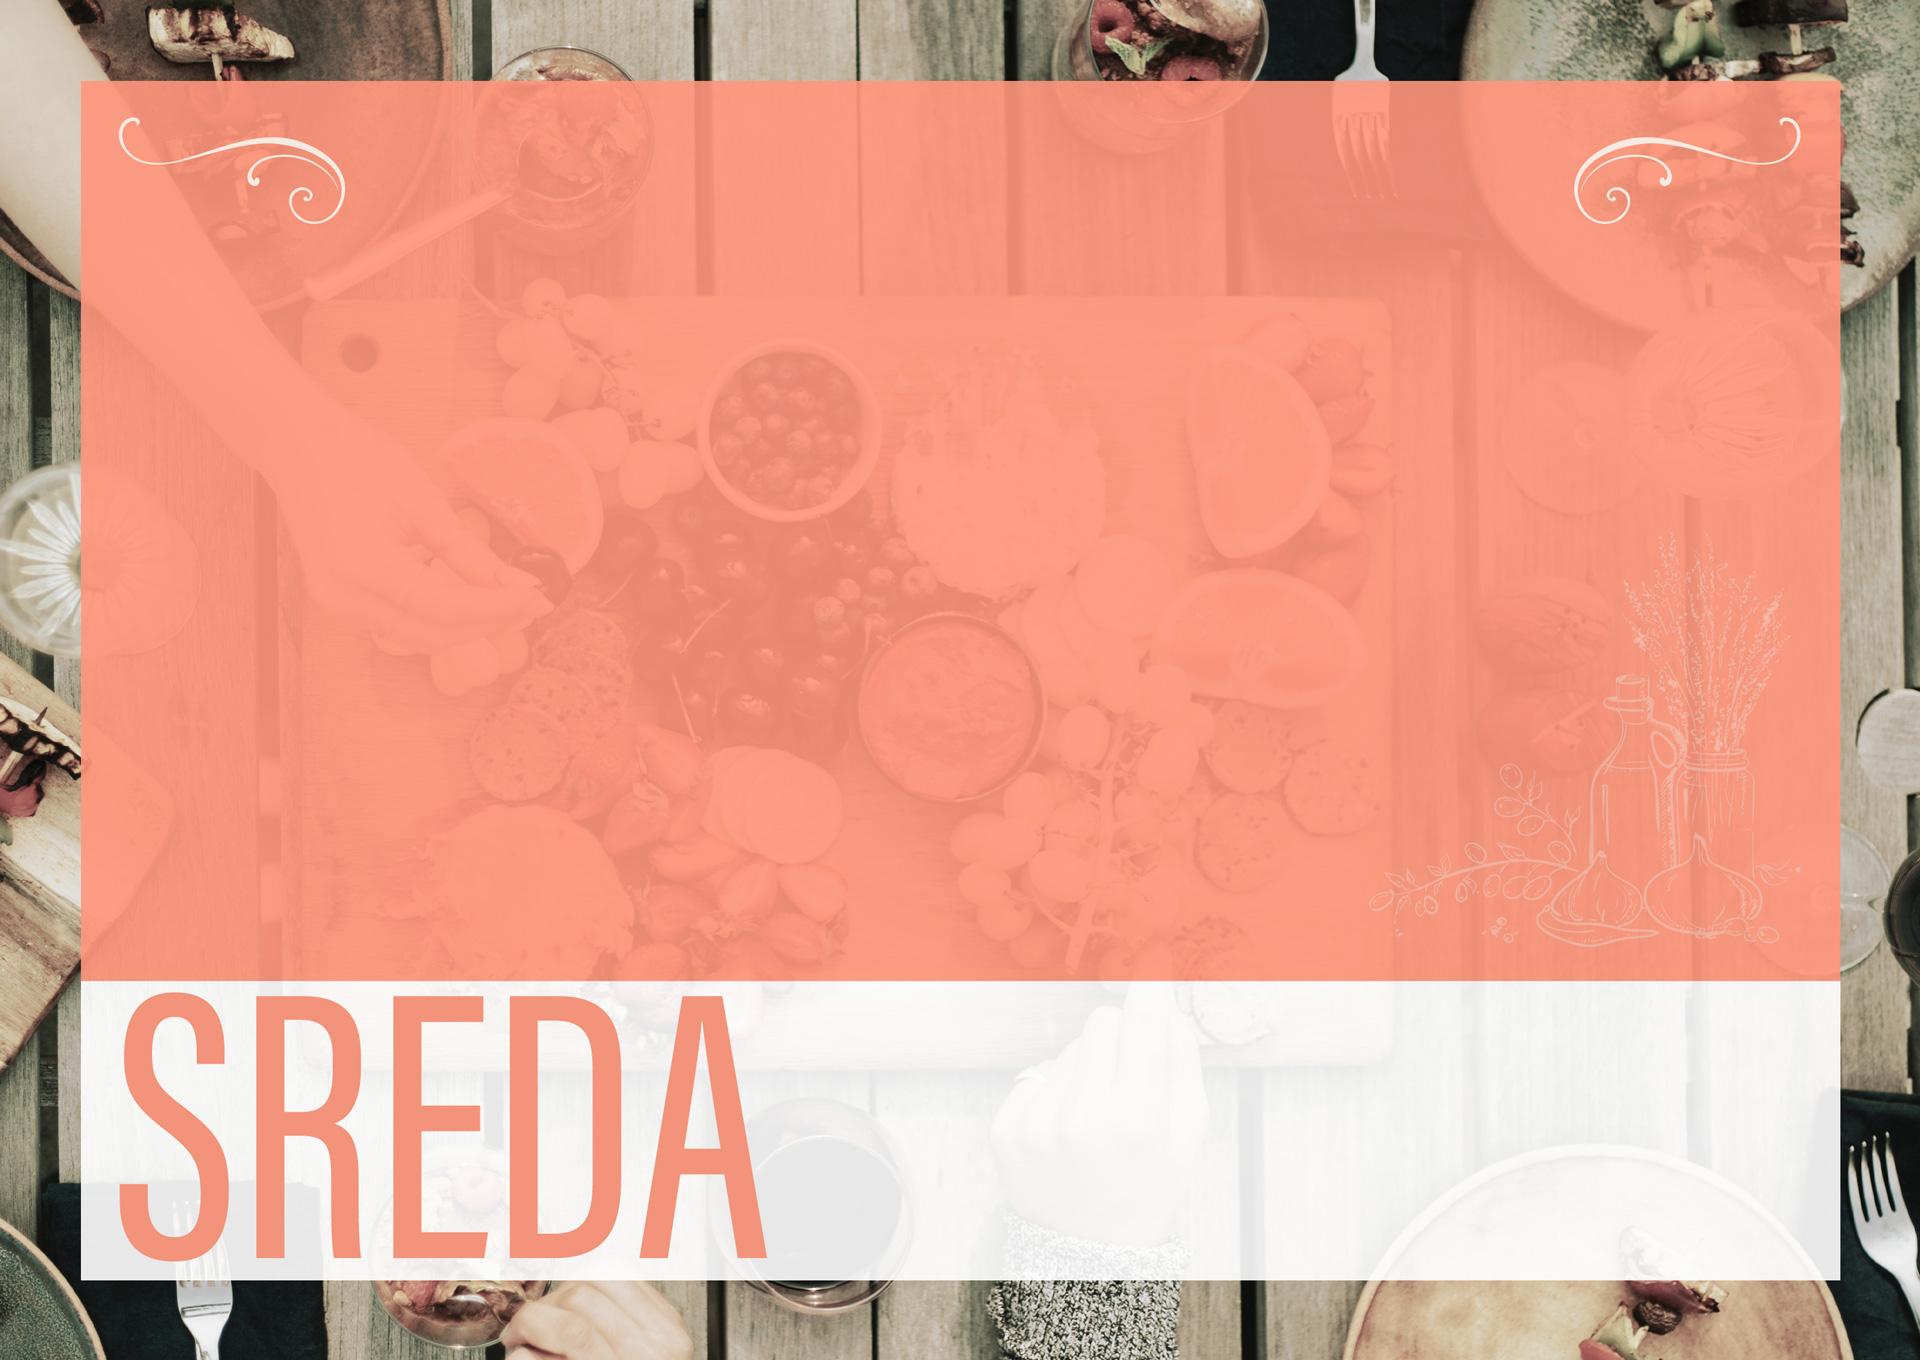 SREDA – 10.3.2021